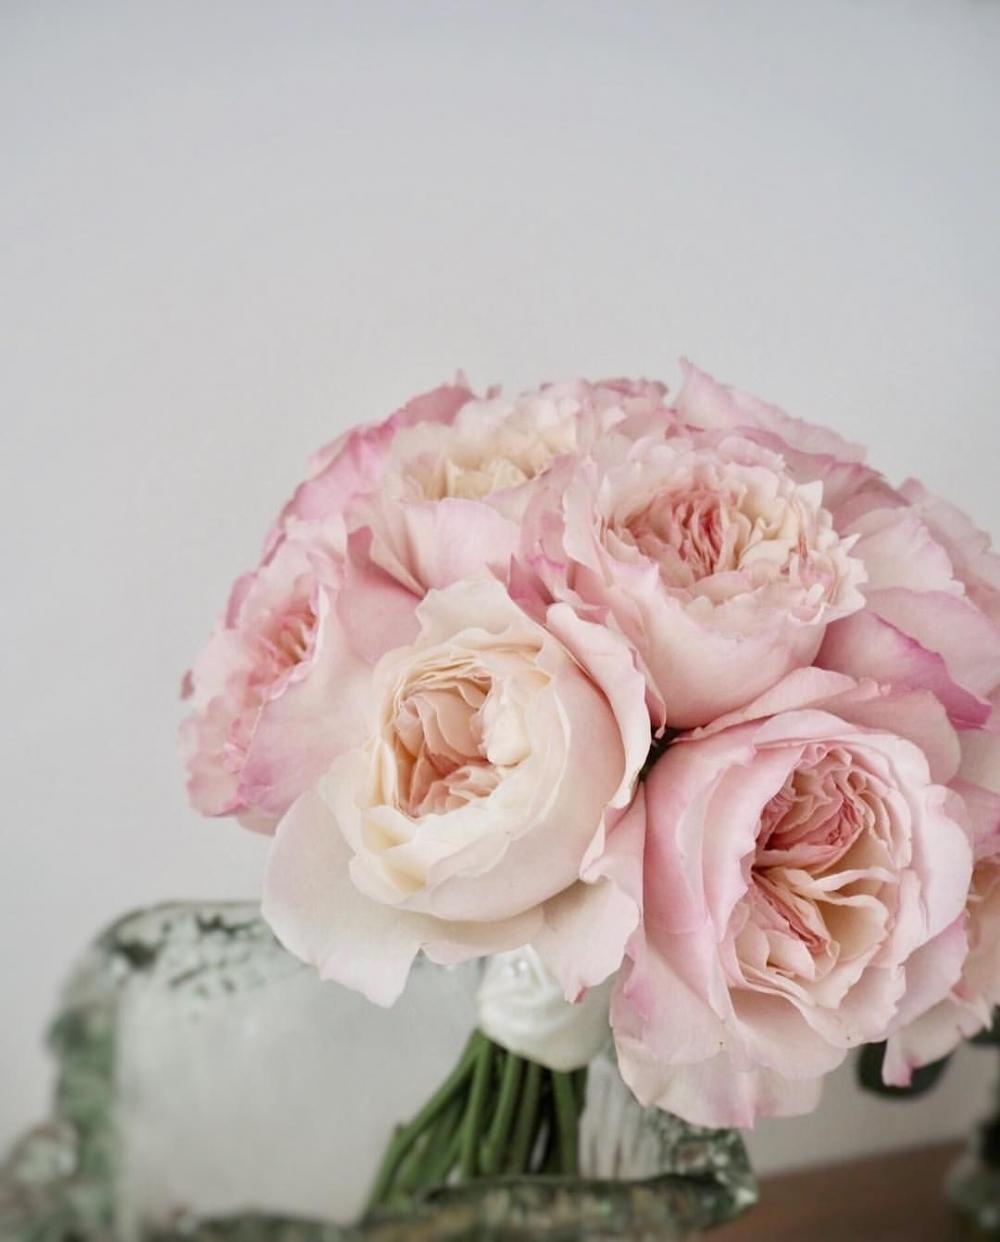 diem danh top 5 hoa hong ngoai vua de trong vua dep  ĐIỂM DANH TOP 5 HOA HỒNG NGOẠI VỪA DỄ TRỒNG VỪA ĐẸP 25fa92db5deedf8ad34323a611ff9990